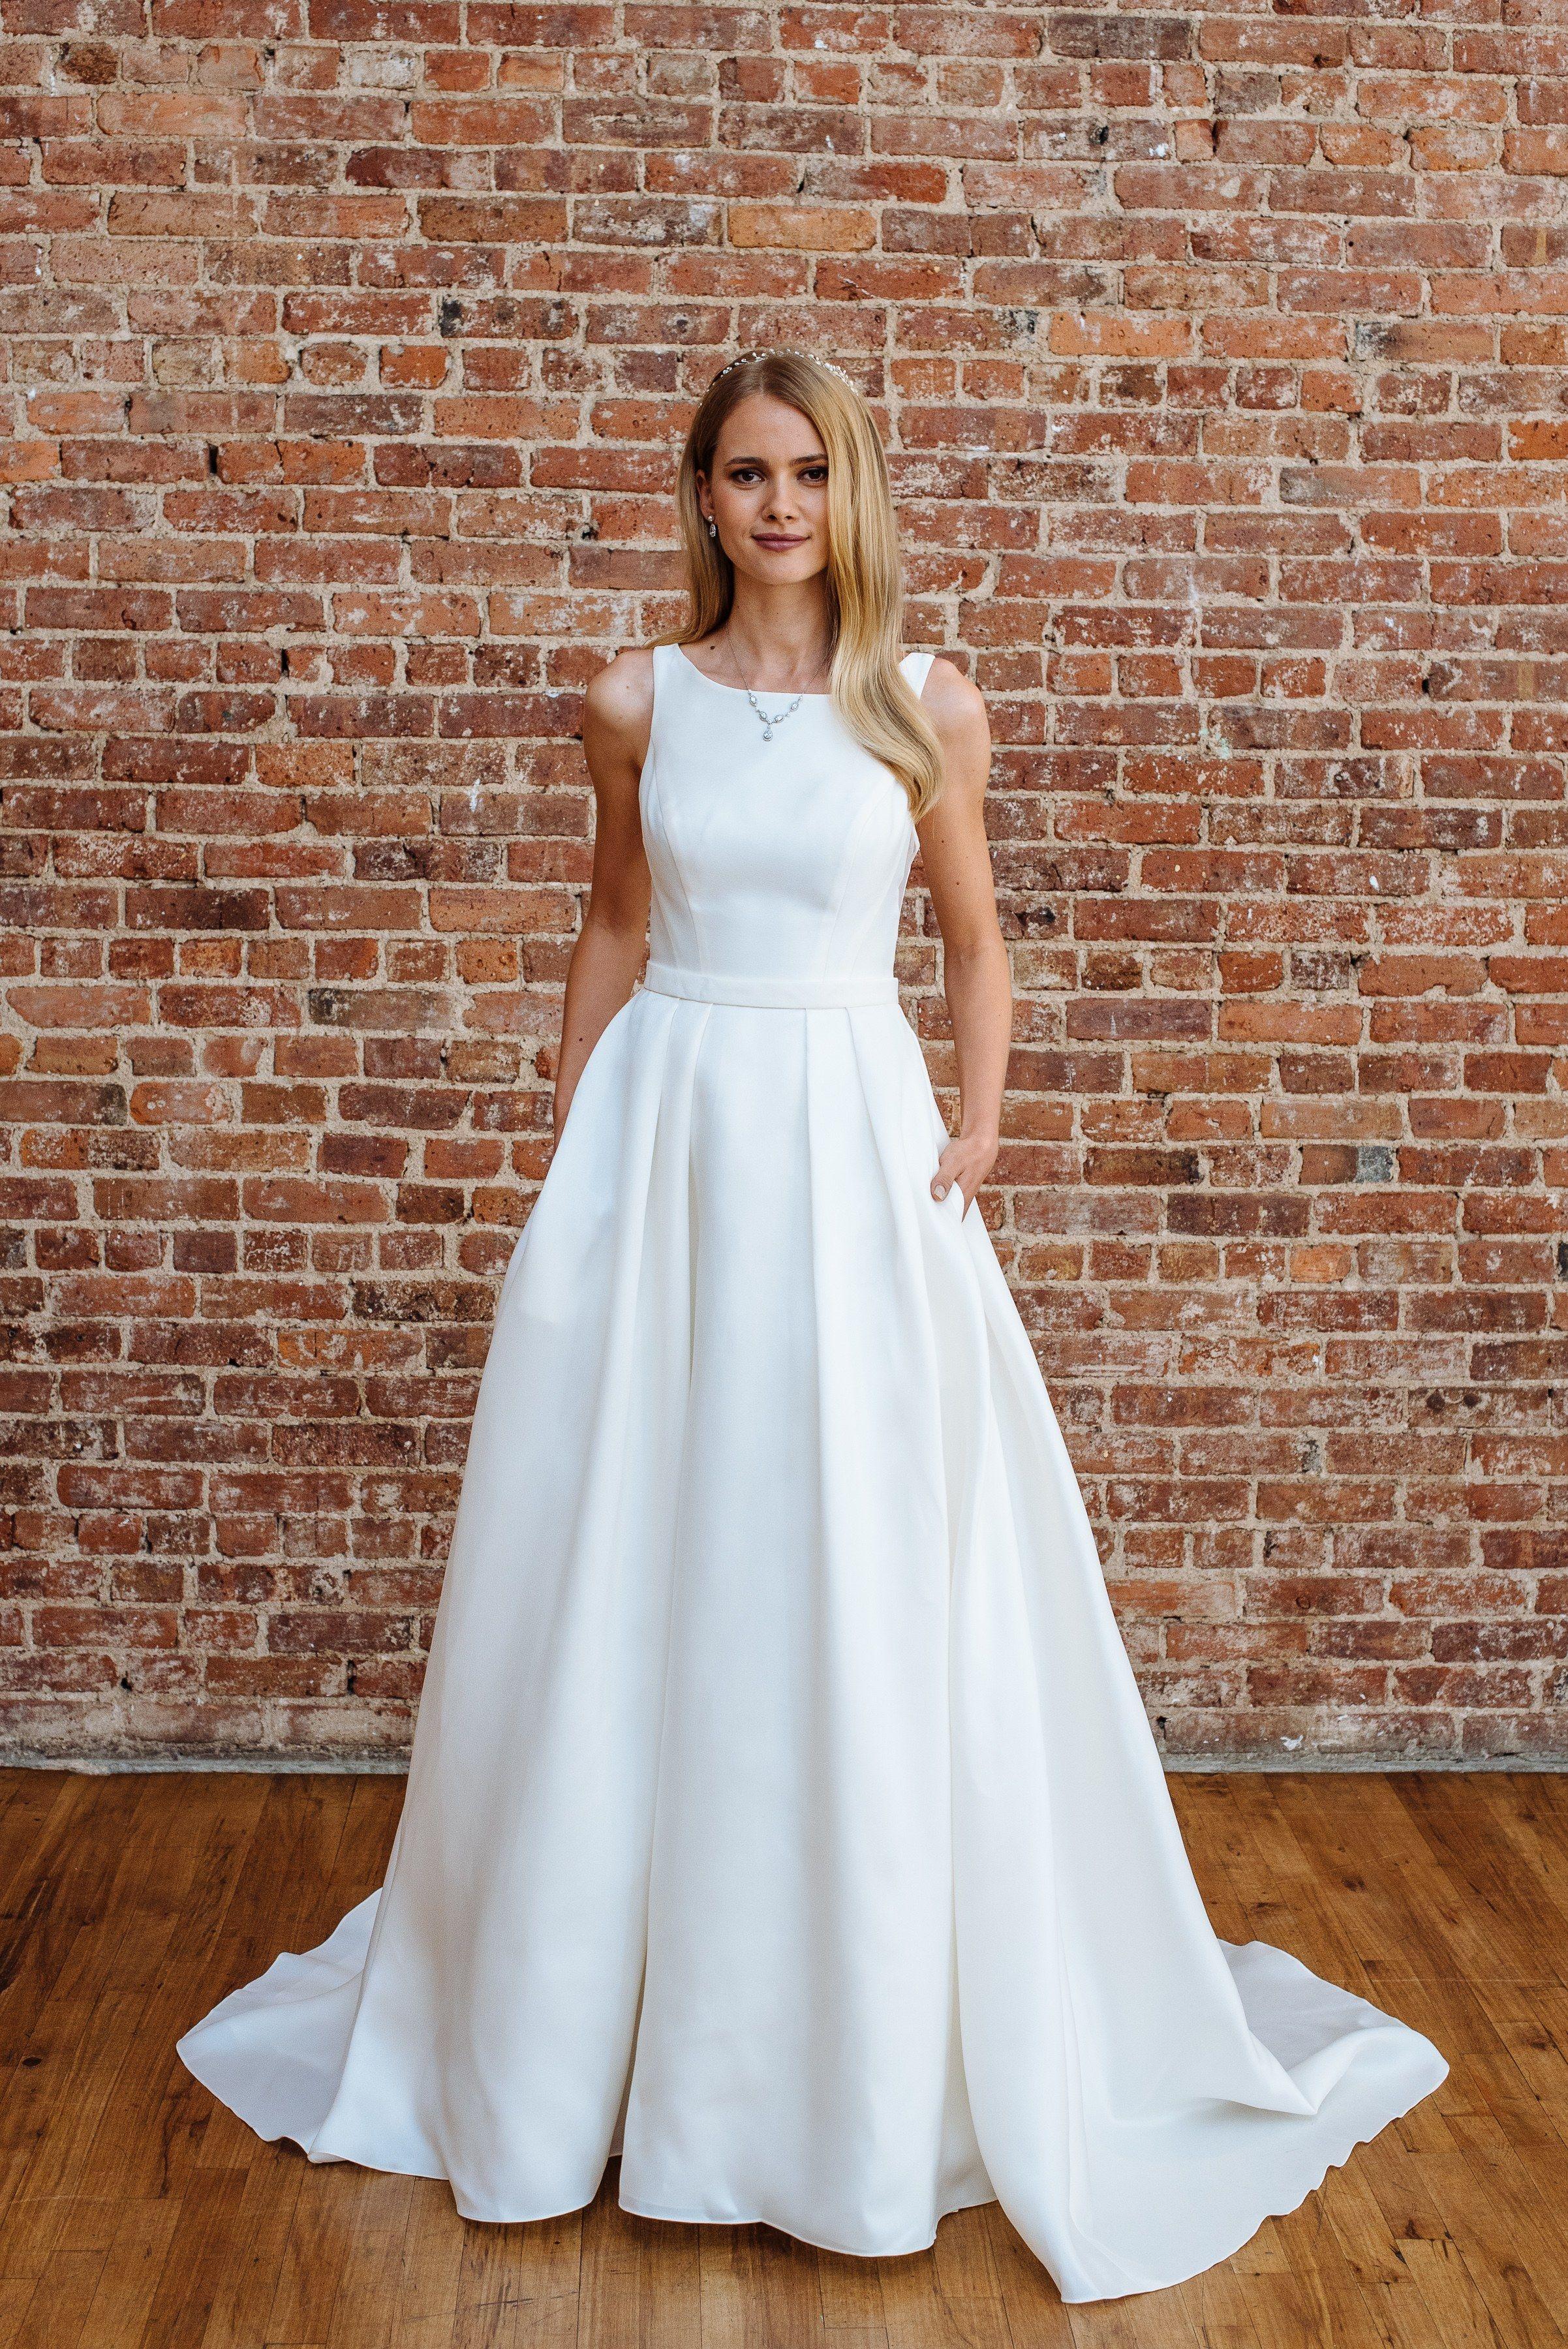 Davidus bridal wedding dresses spring fall bridal